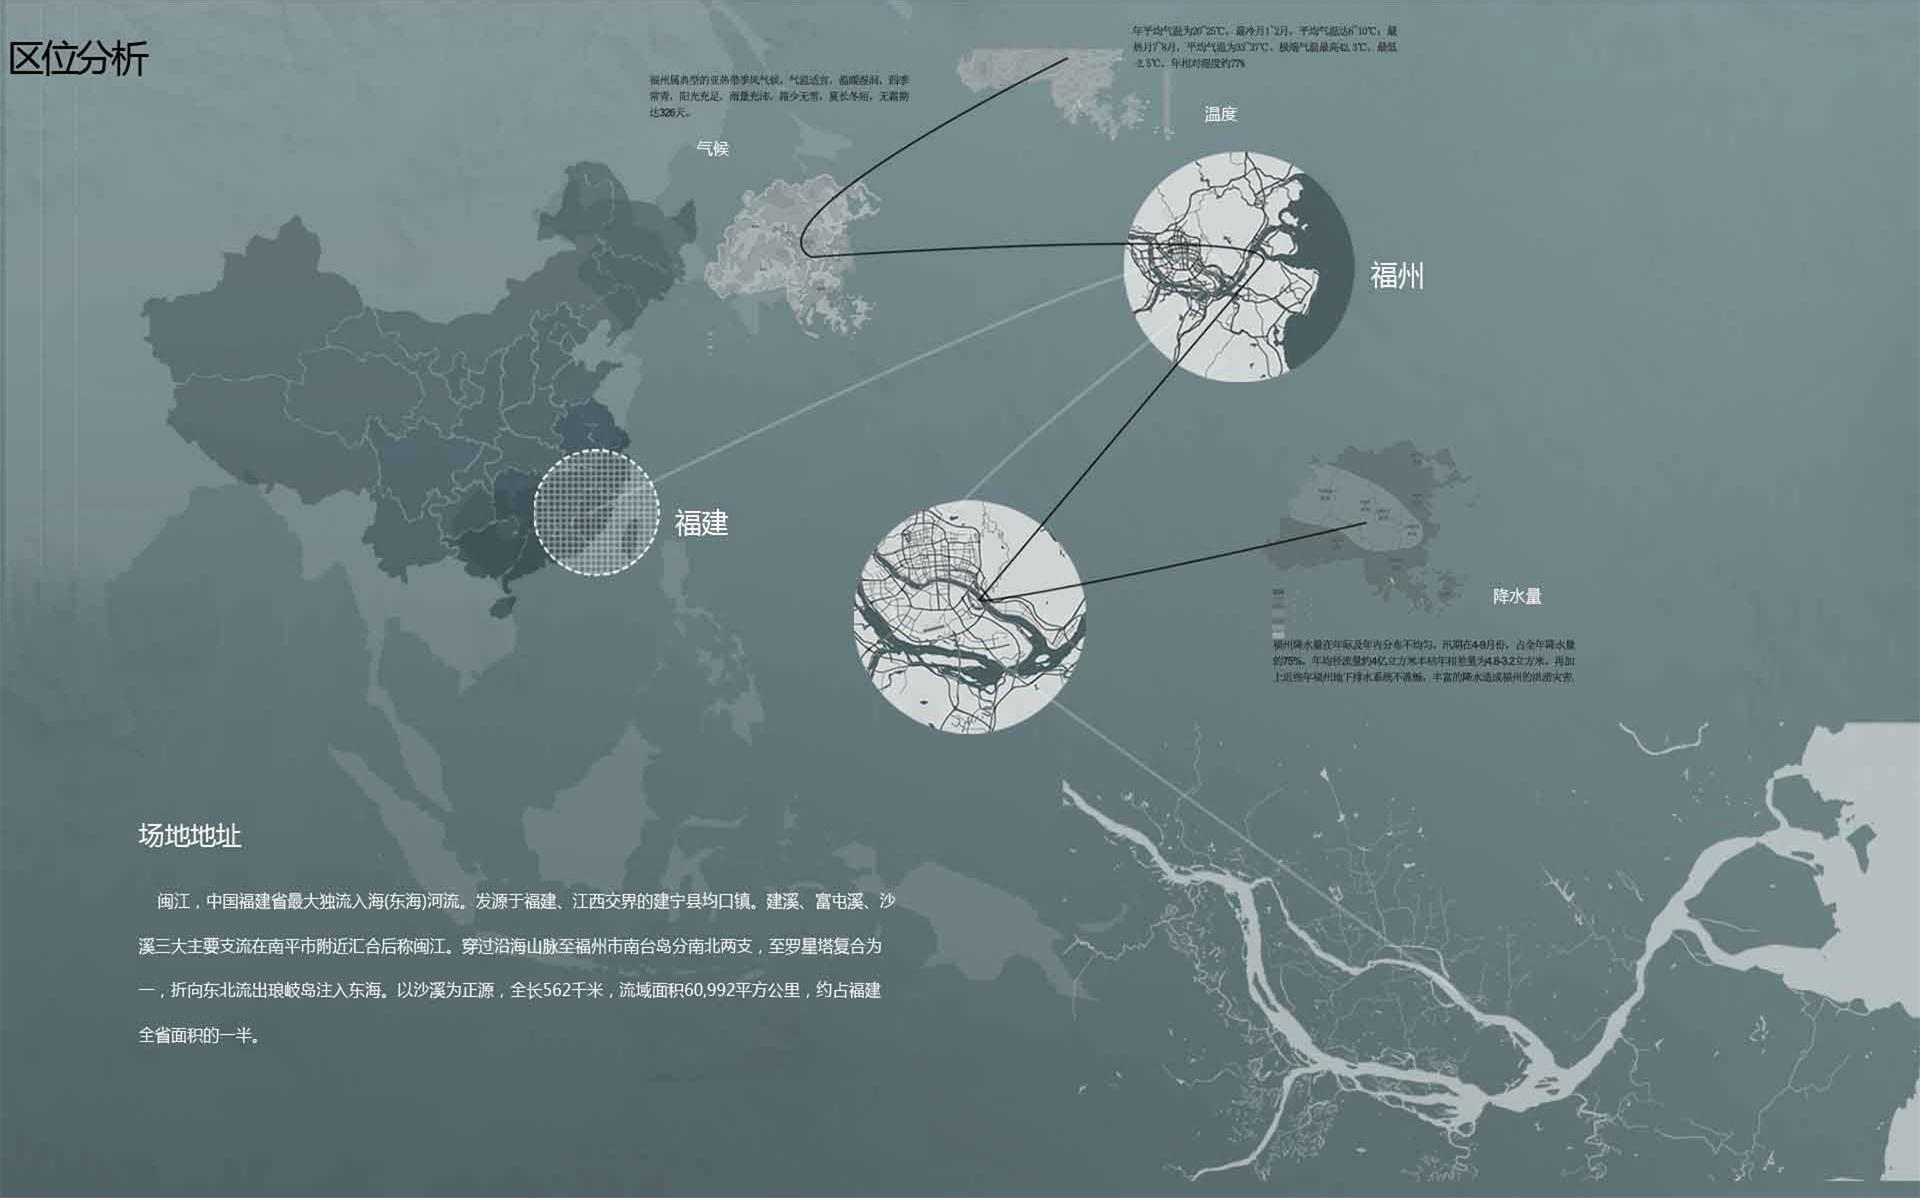 2018LA前锋奖:很多采砂导致资源干涸型盐碱地身份重塑——以福州闽江口为例